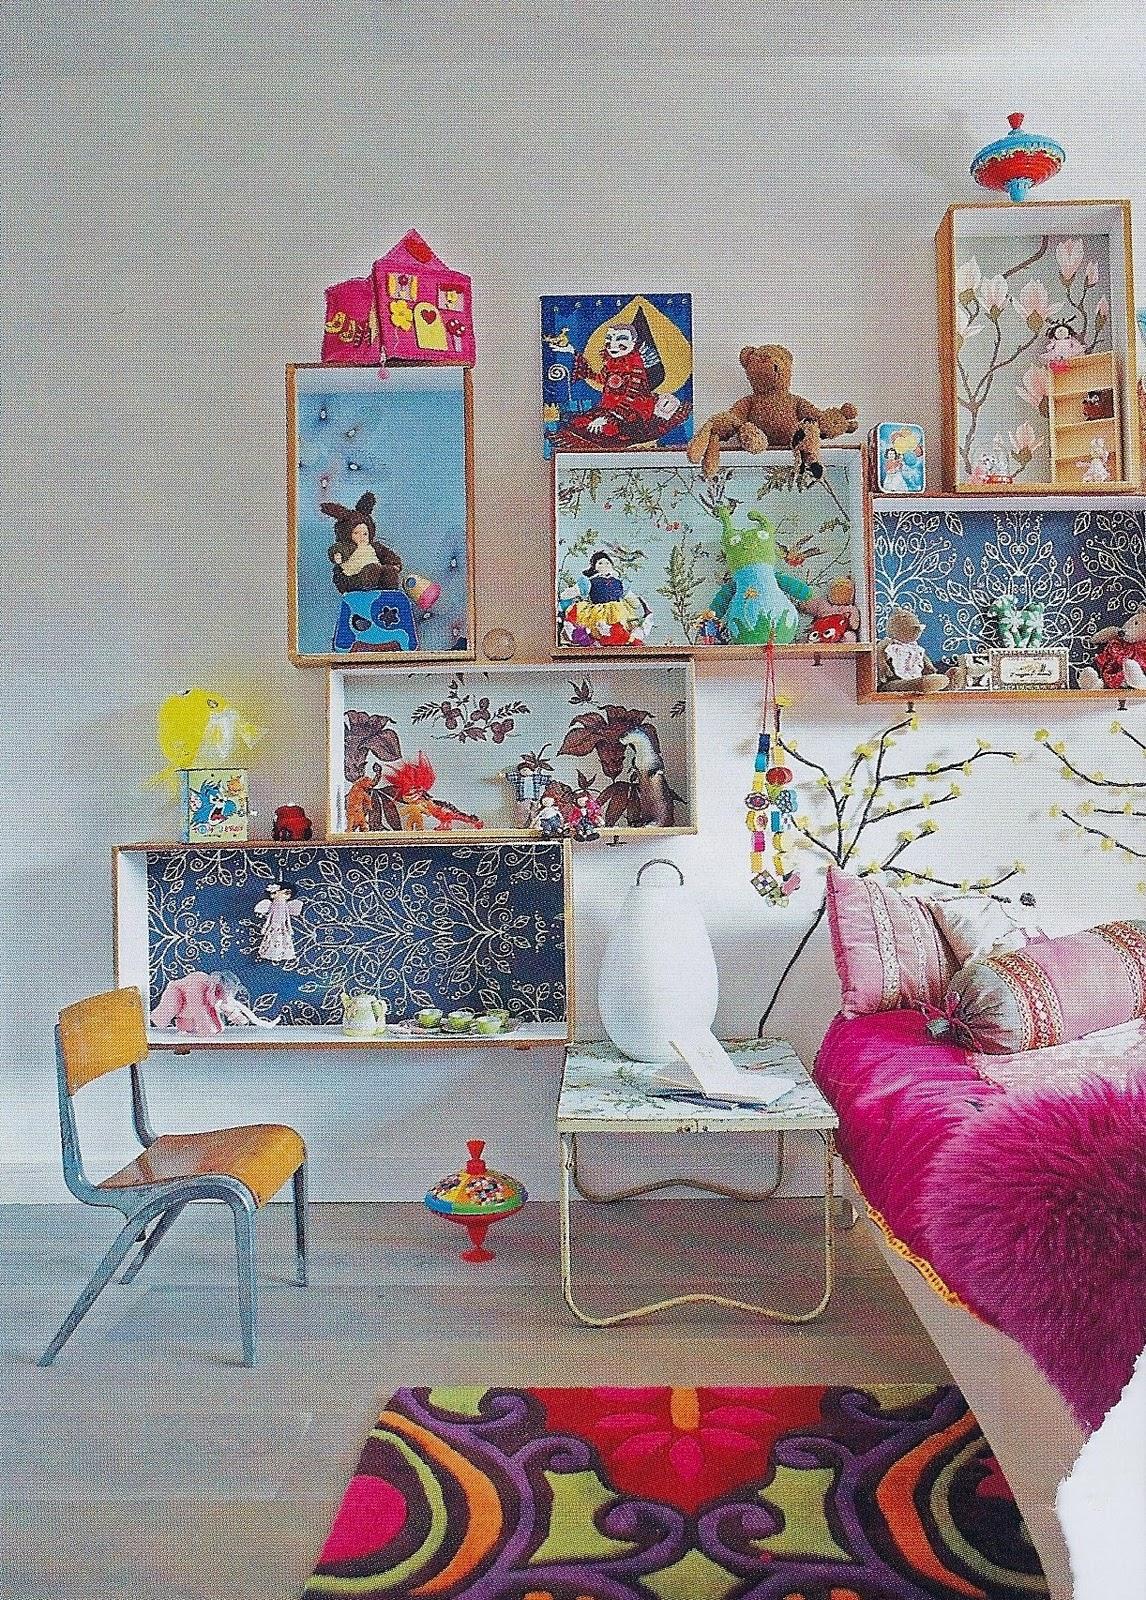 Kids Room Wallpaper Designs: Wallpaper: Wallpaper Ideas For Kids Room